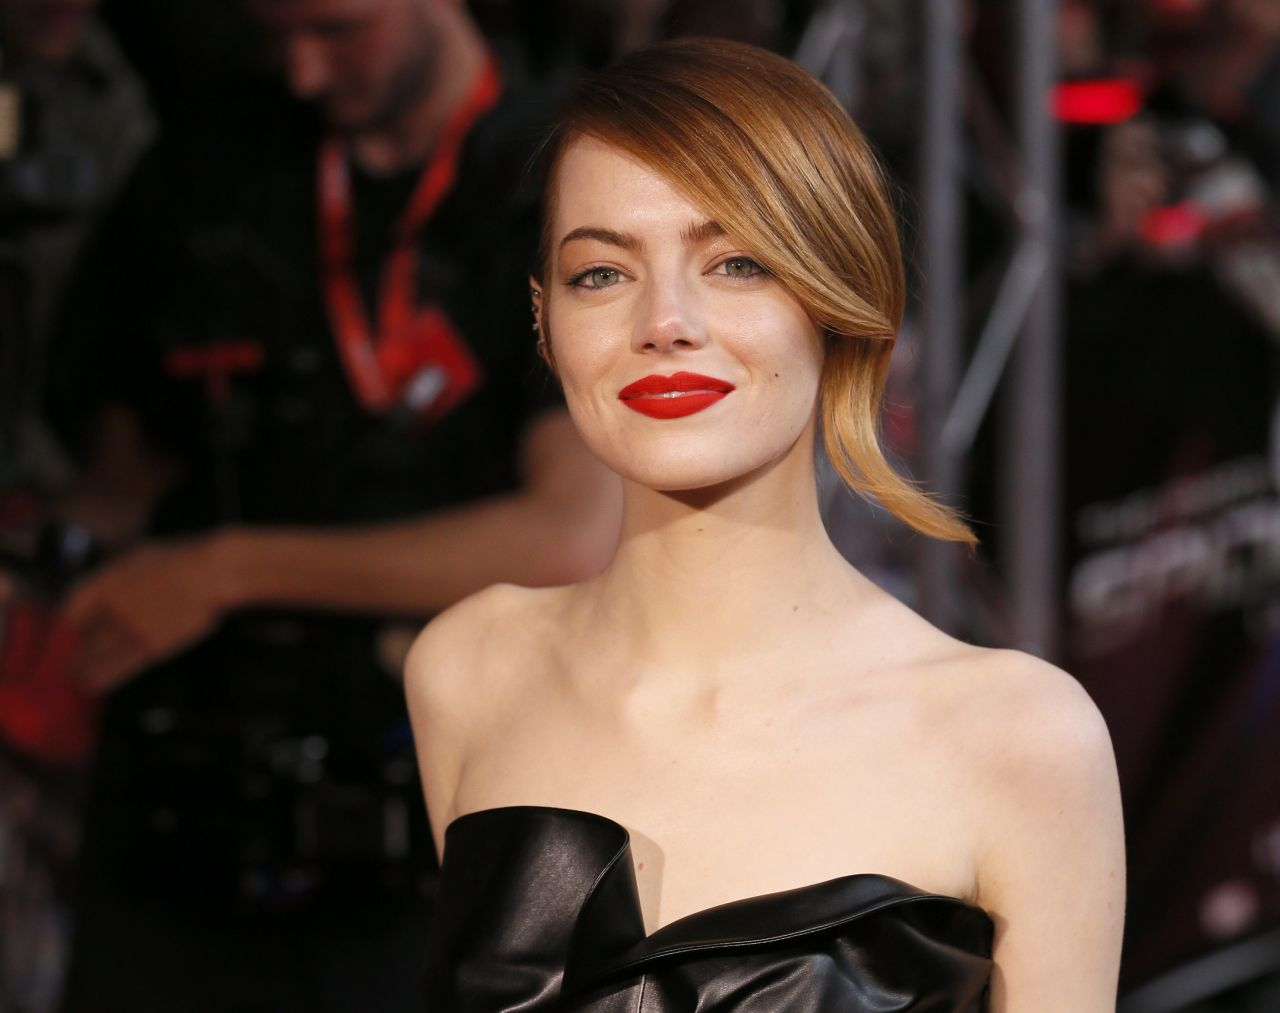 Emma Stone Wearing Lanvin Leather Dress - 'The Amazing ... Emma Stone